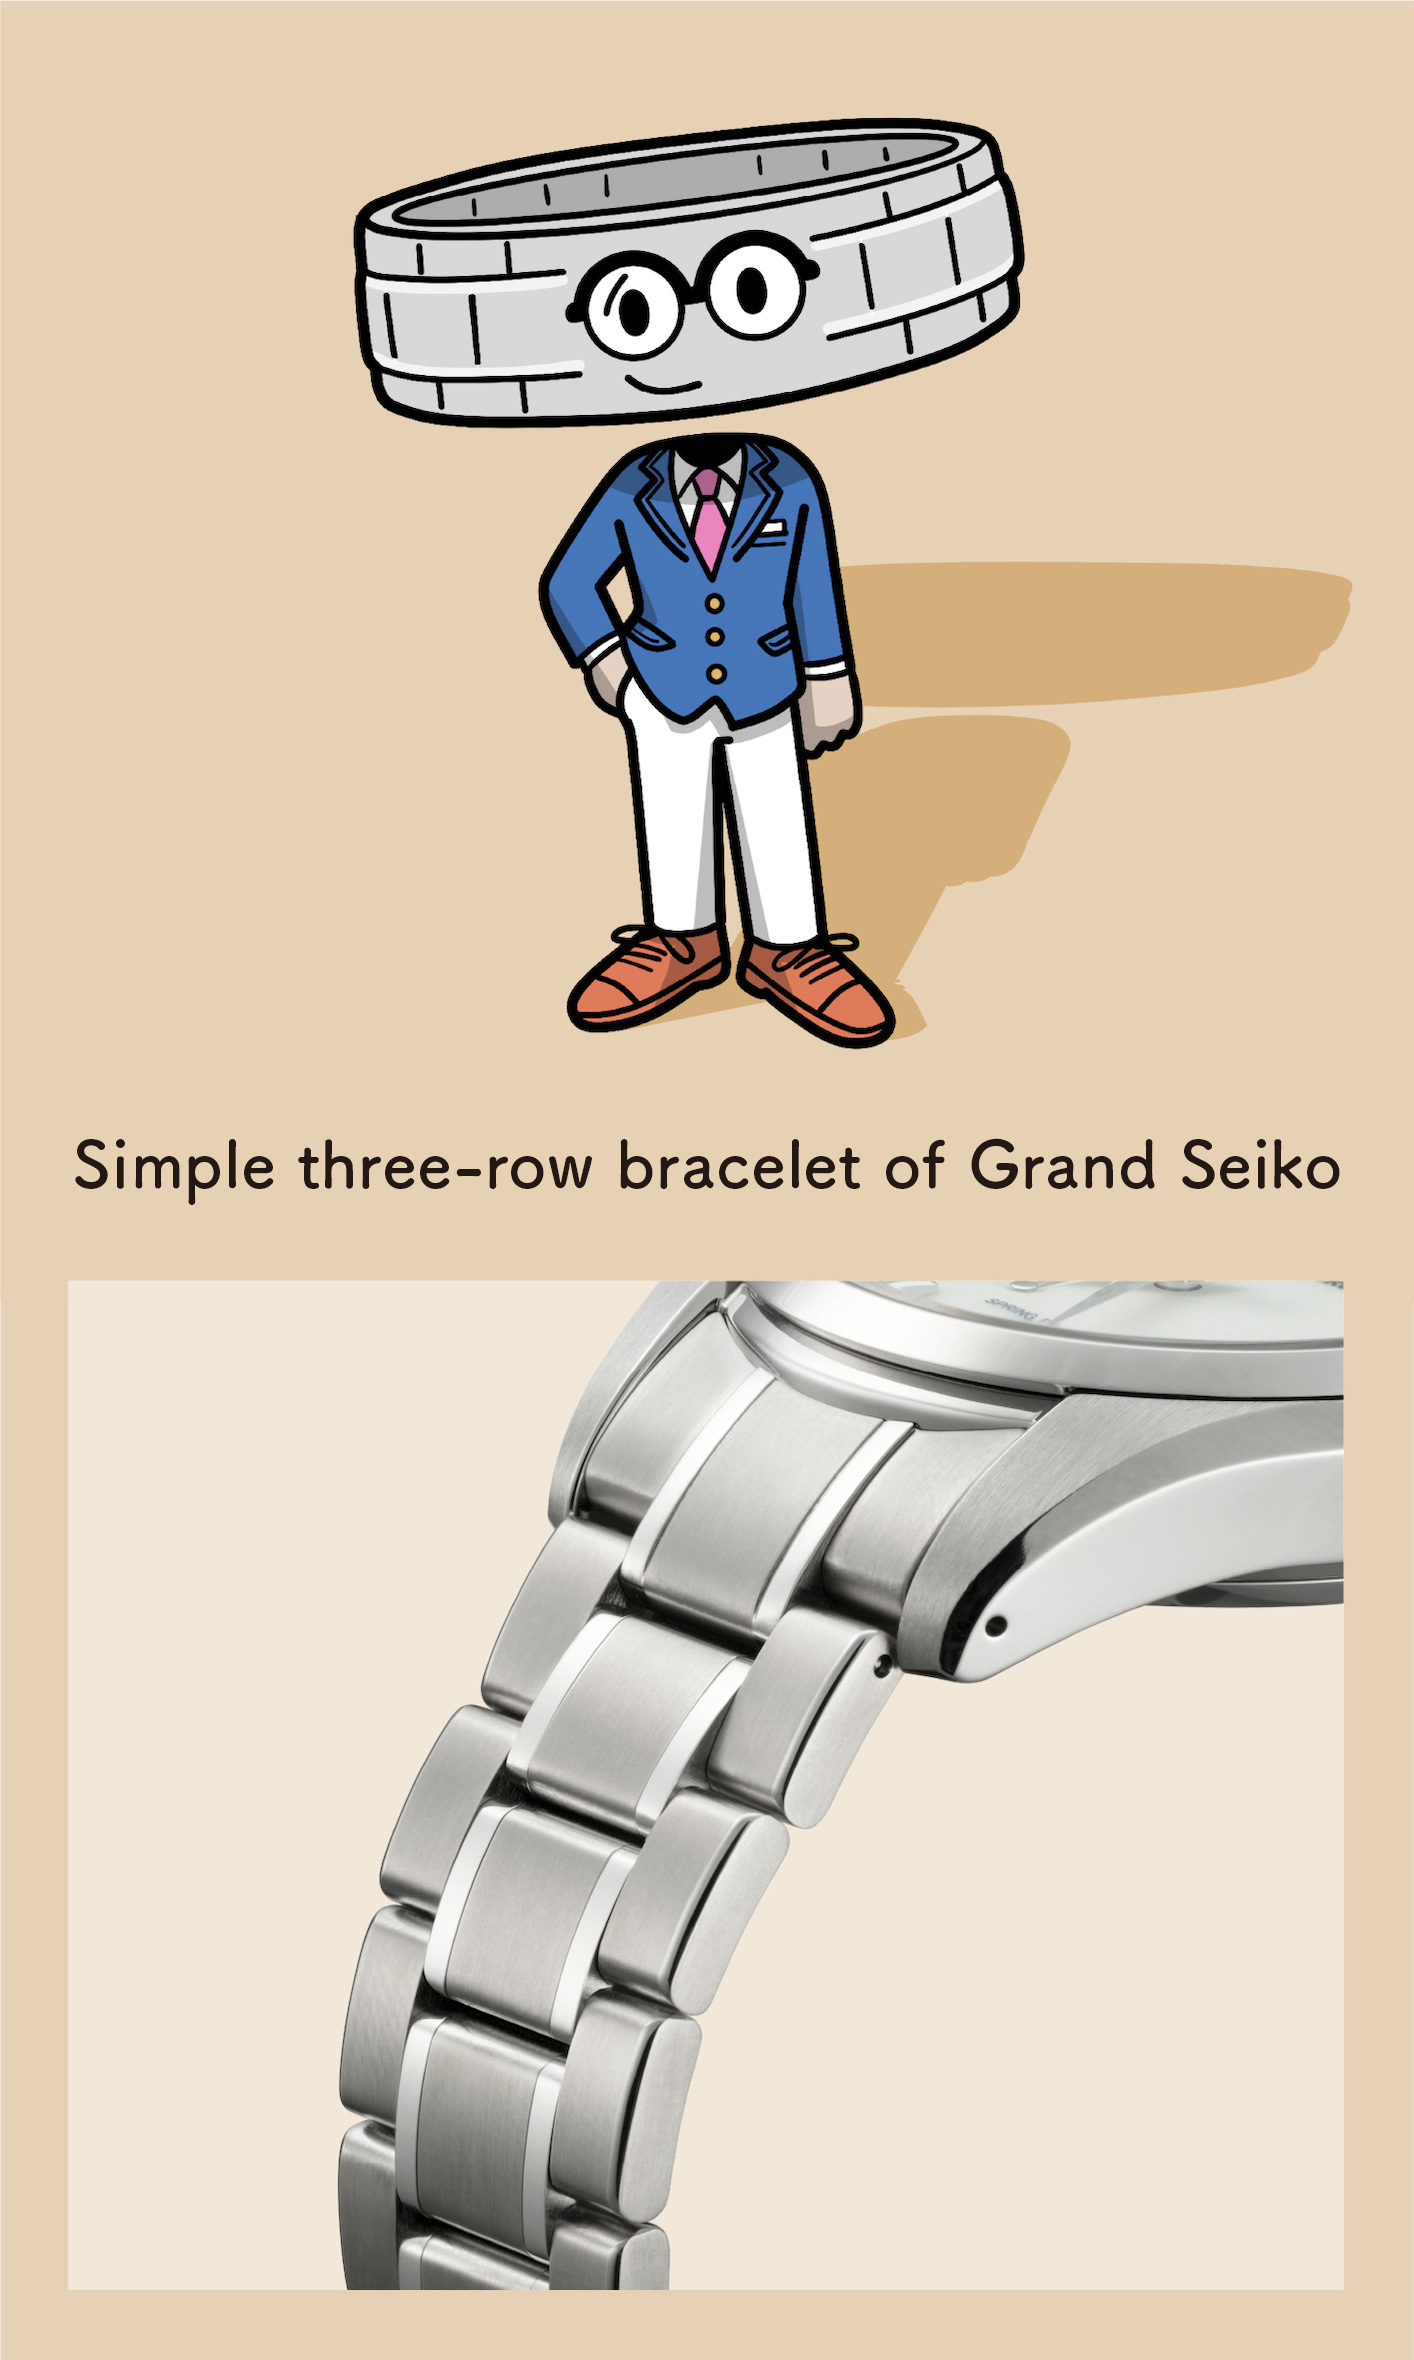 Simple three-row bracelet of Grand Seiko (Enlarged photo of the bracelet)